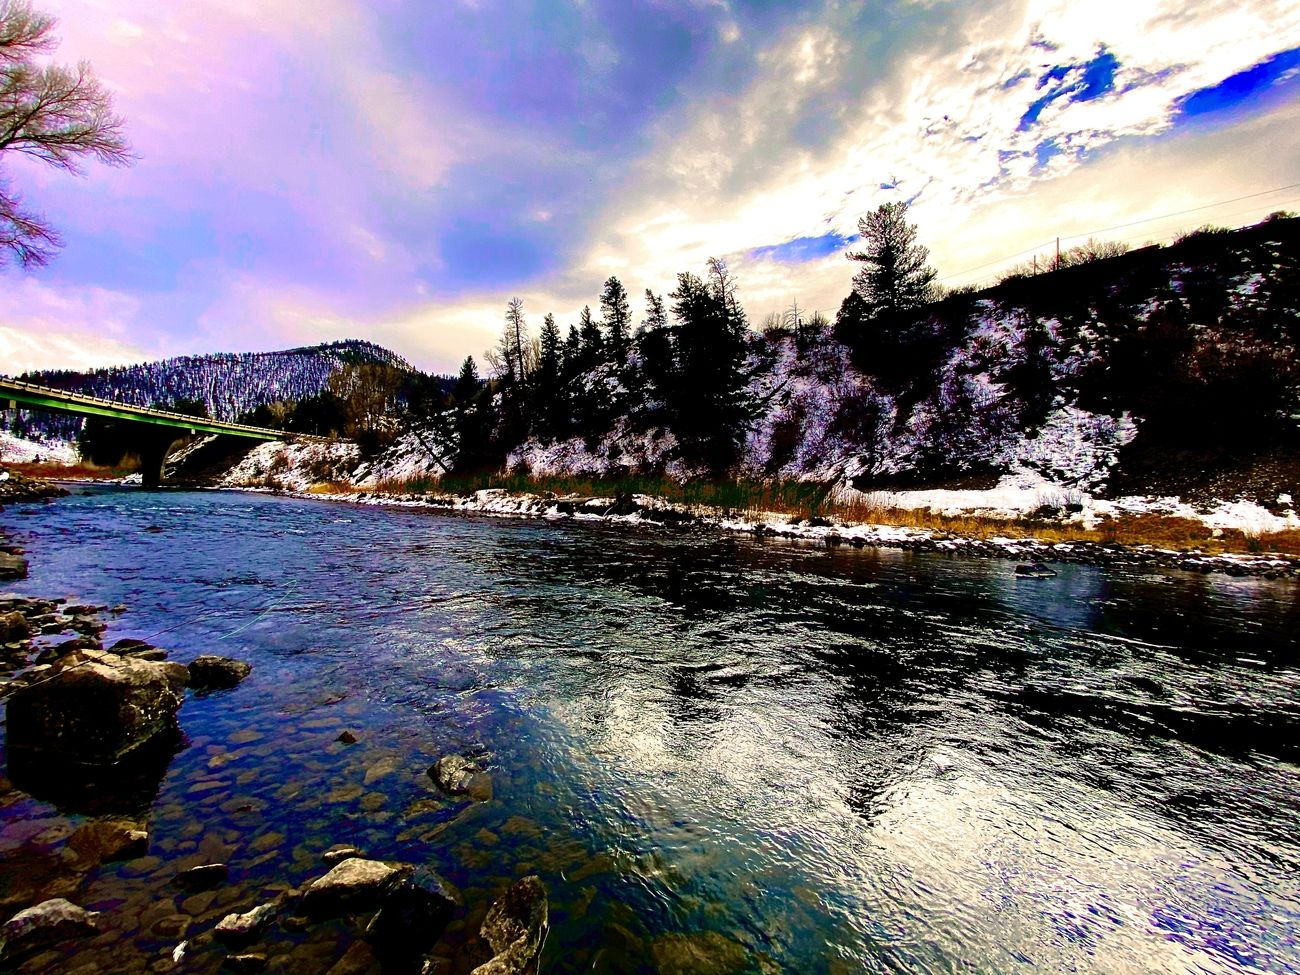 The Colorado River near Parshall, Colorado 11/2020